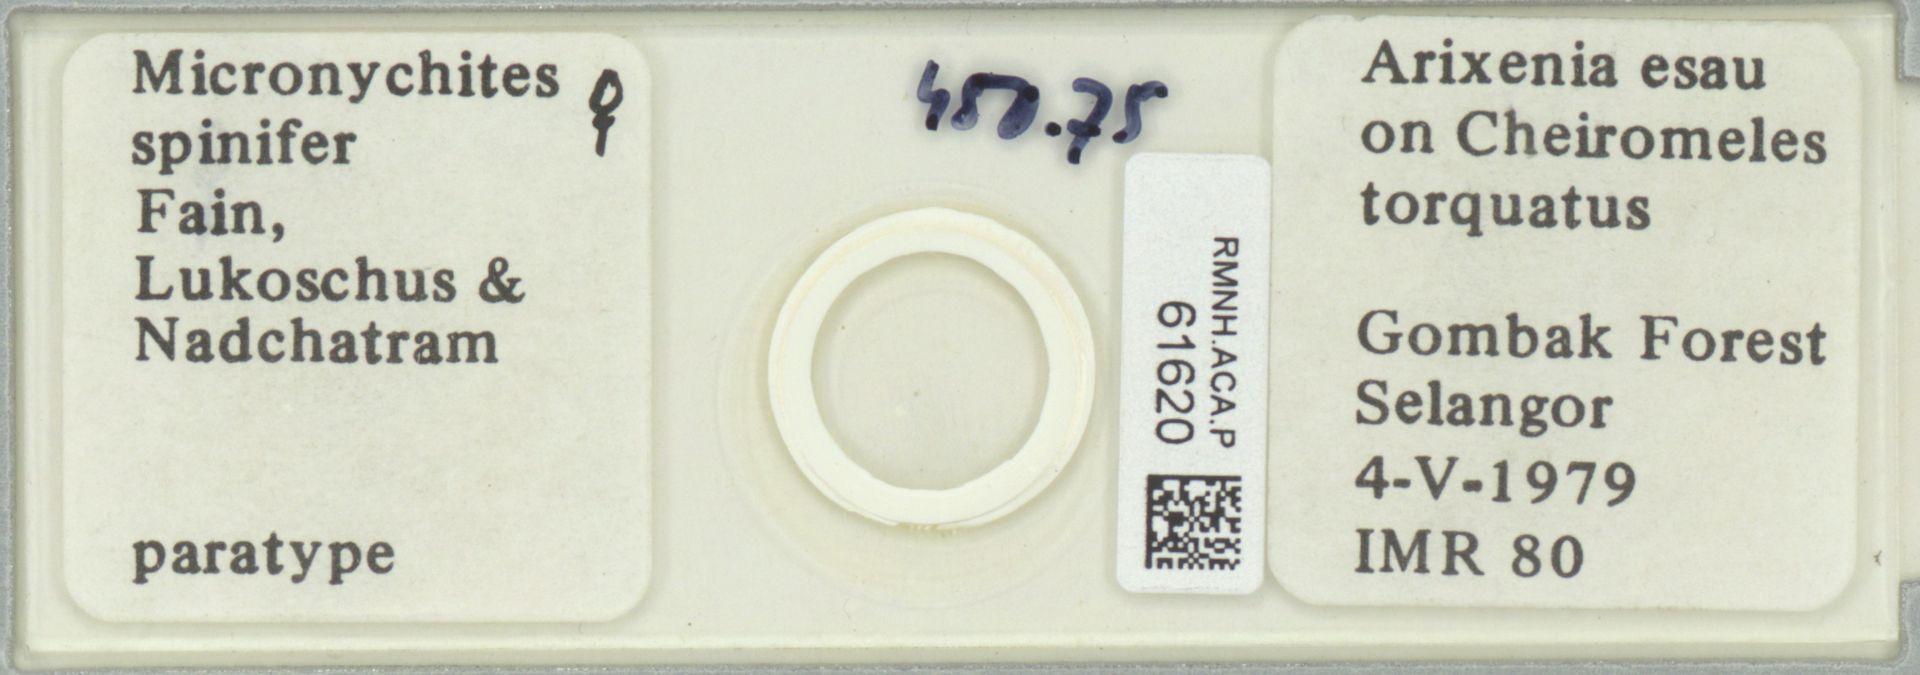 RMNH.ACA.P.61620 | Micronychites spinifer Fain, Lukoschus & Nadchatram